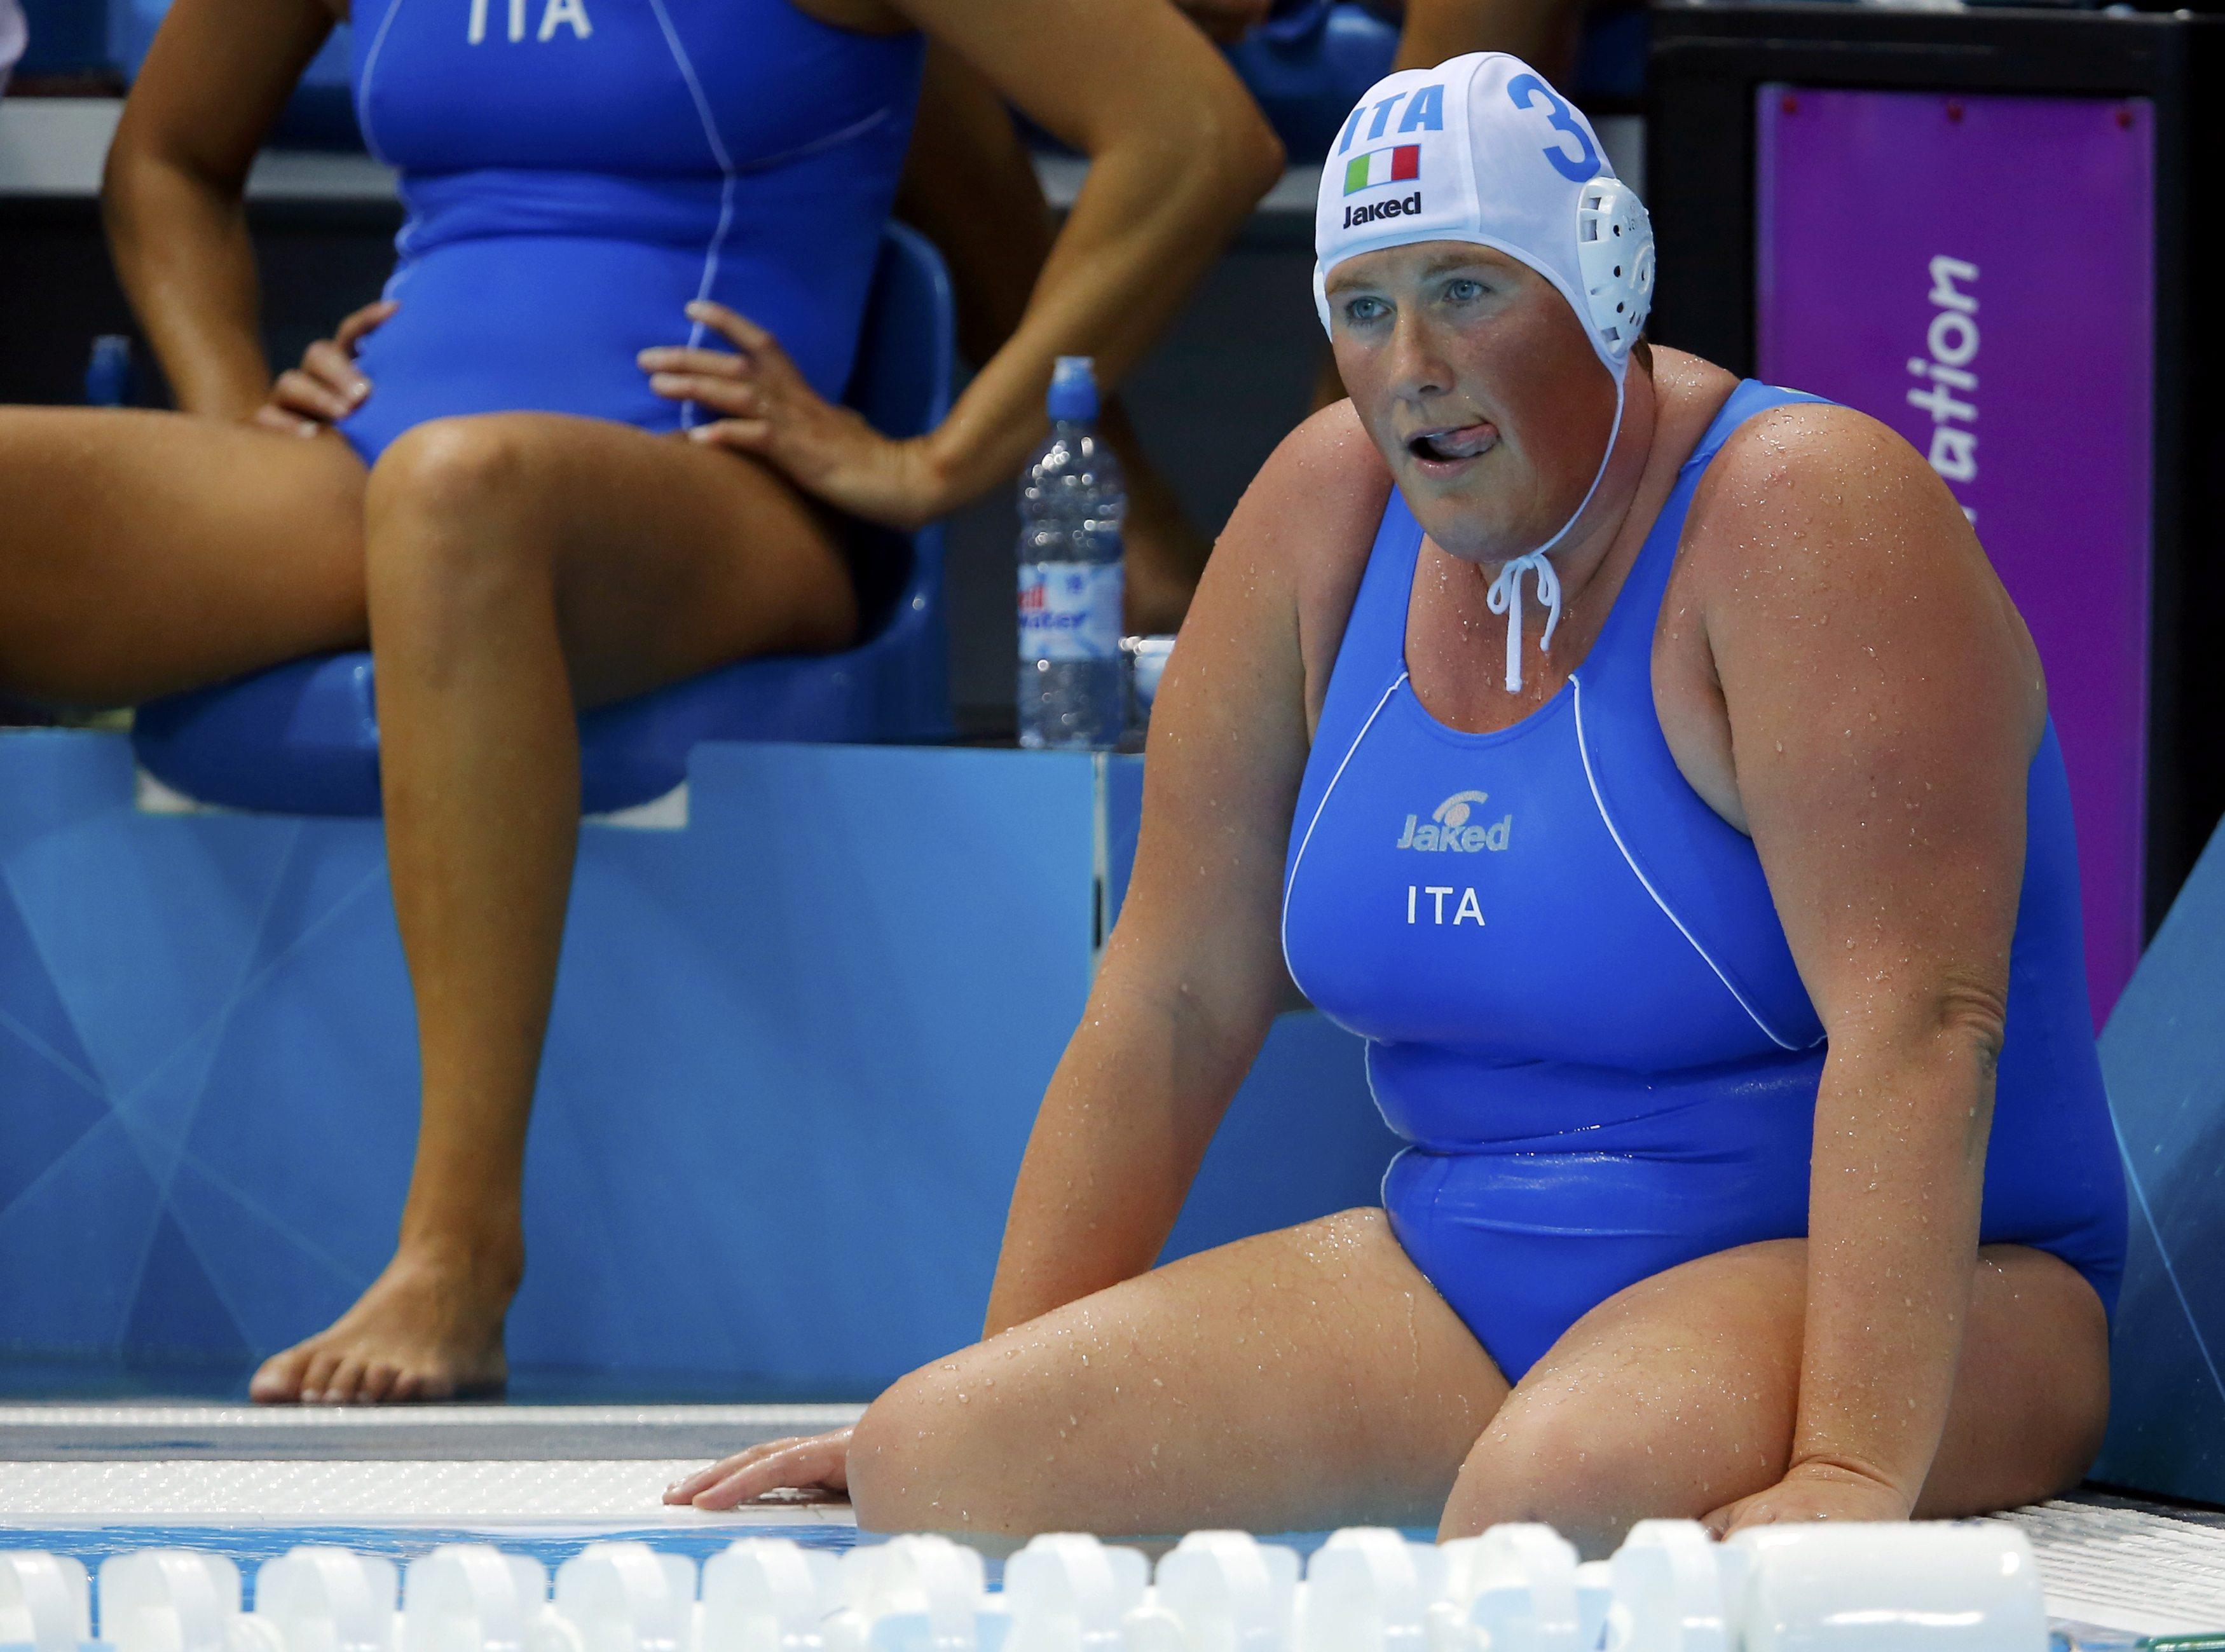 Elisa Casanova a bordo vasca (Reuters)